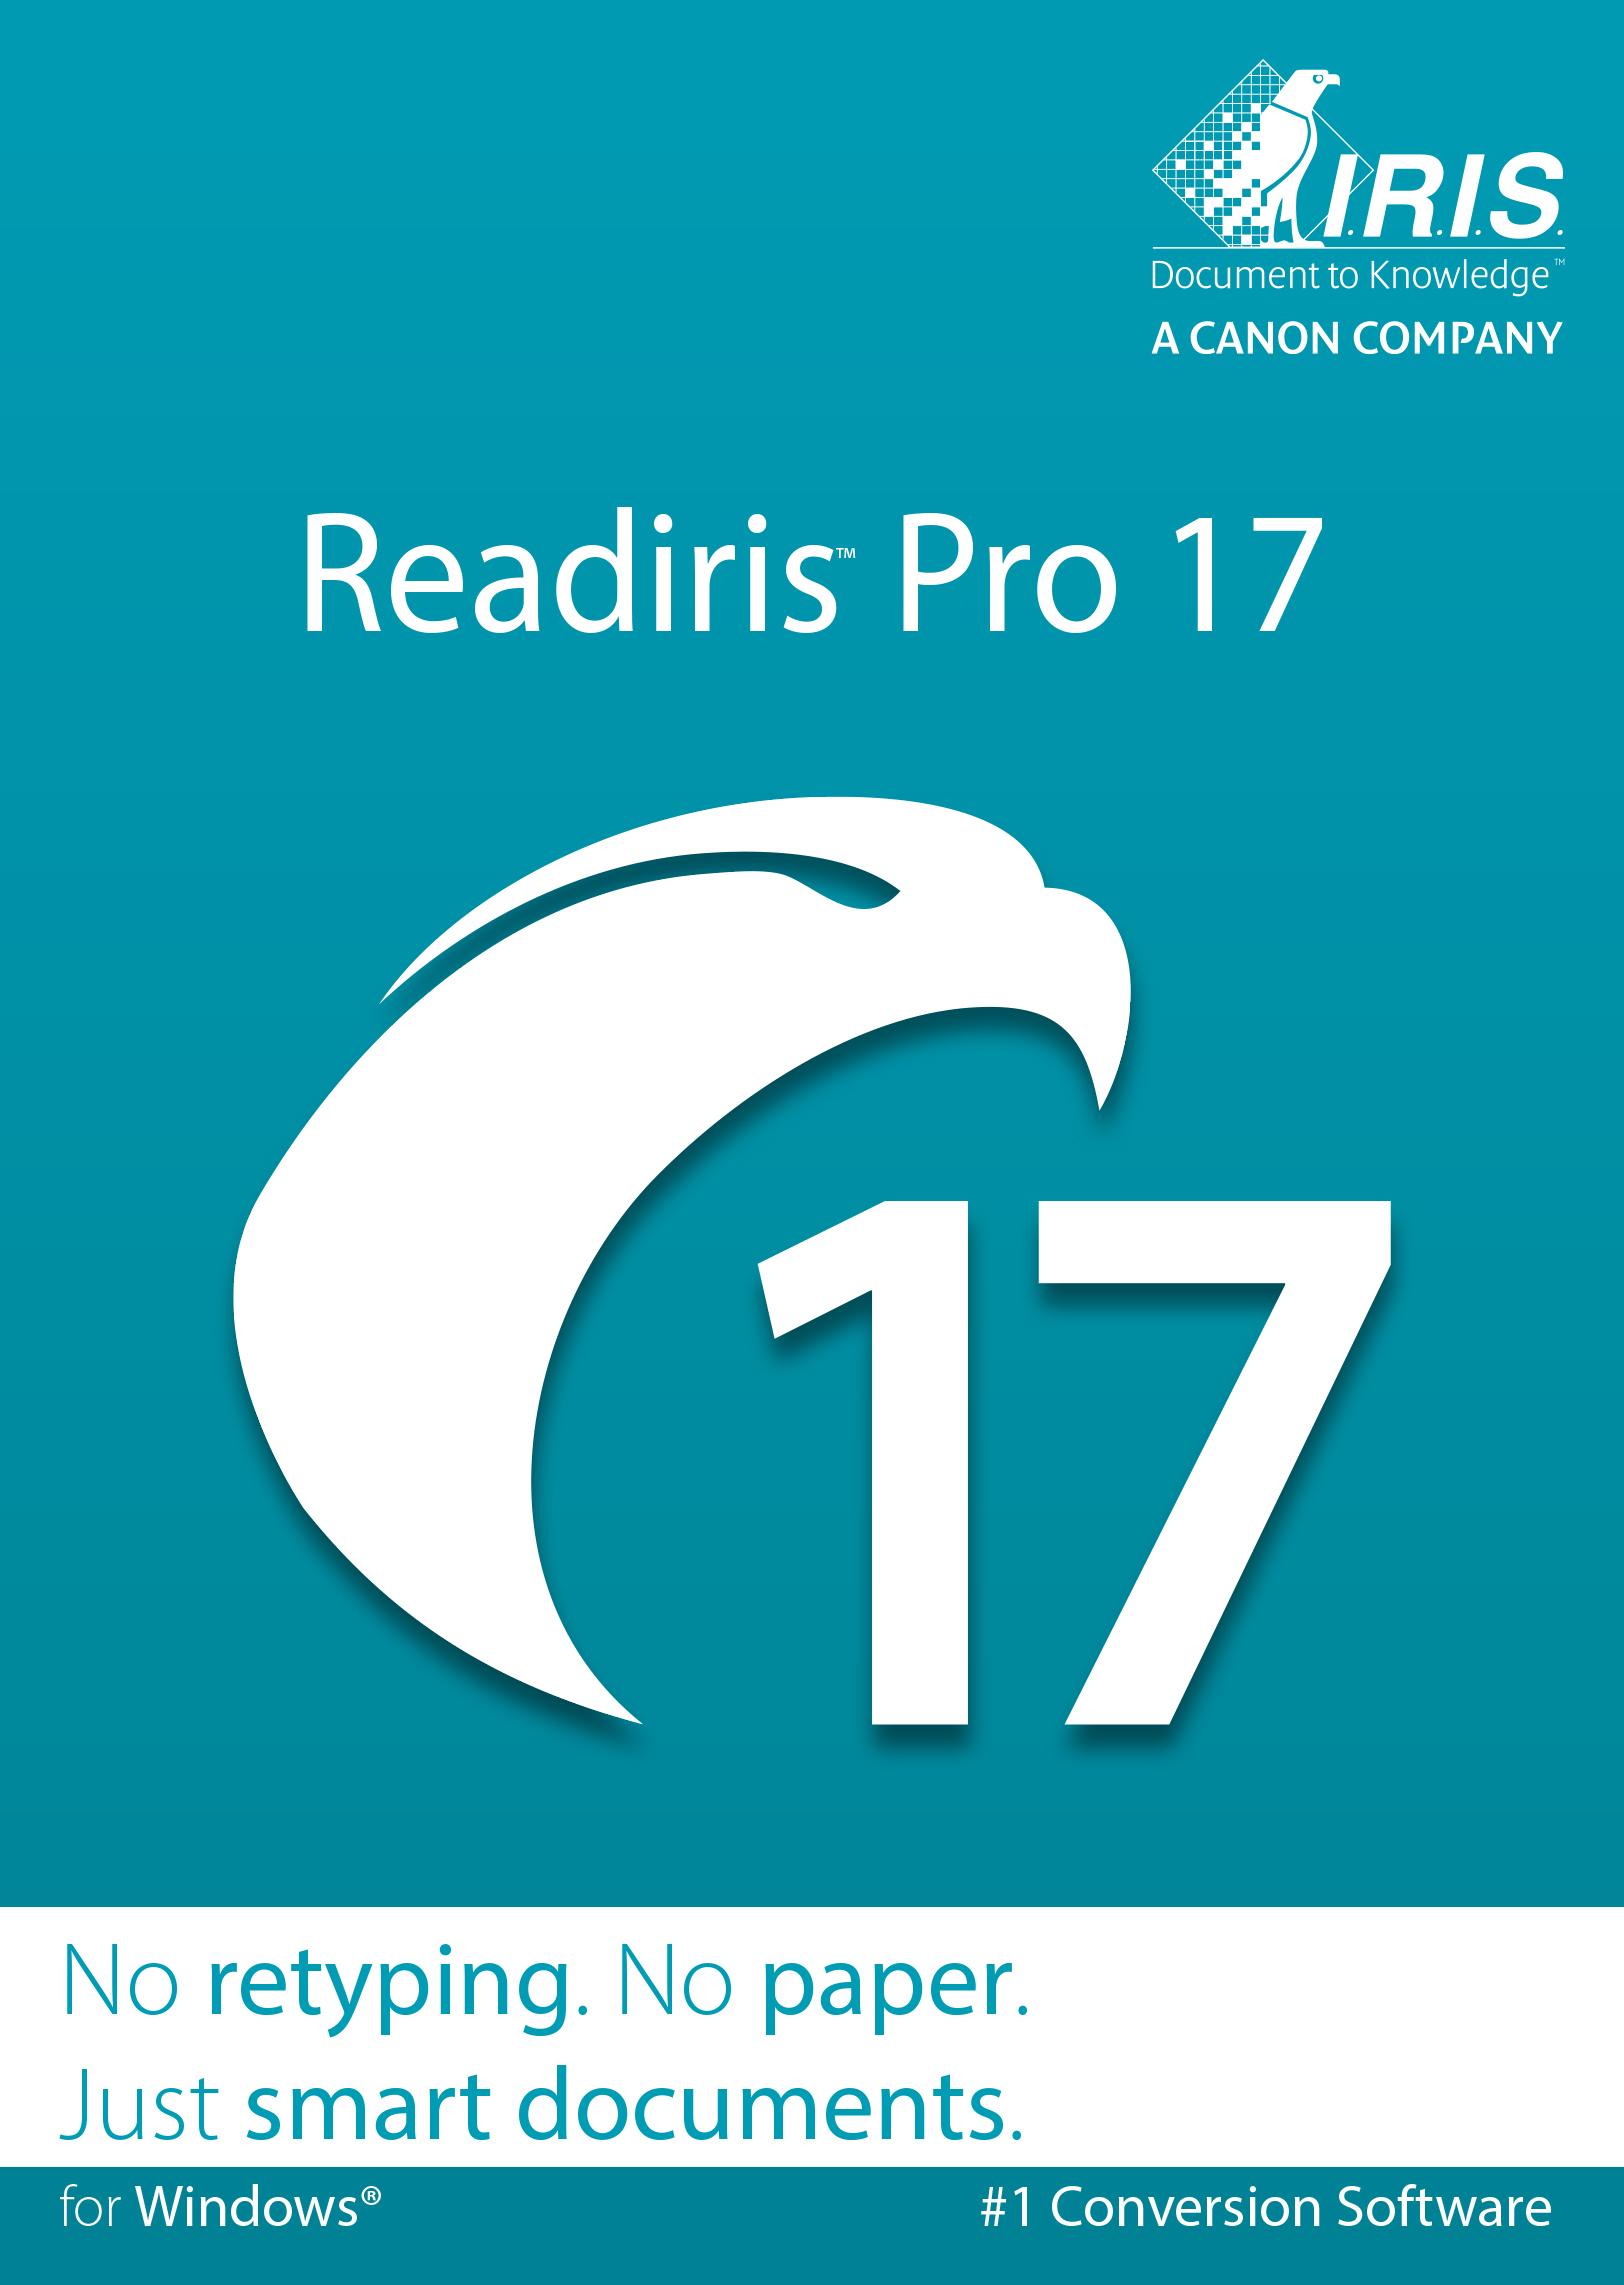 Readiris Pro 17 for Windows - Conversion software [Download]